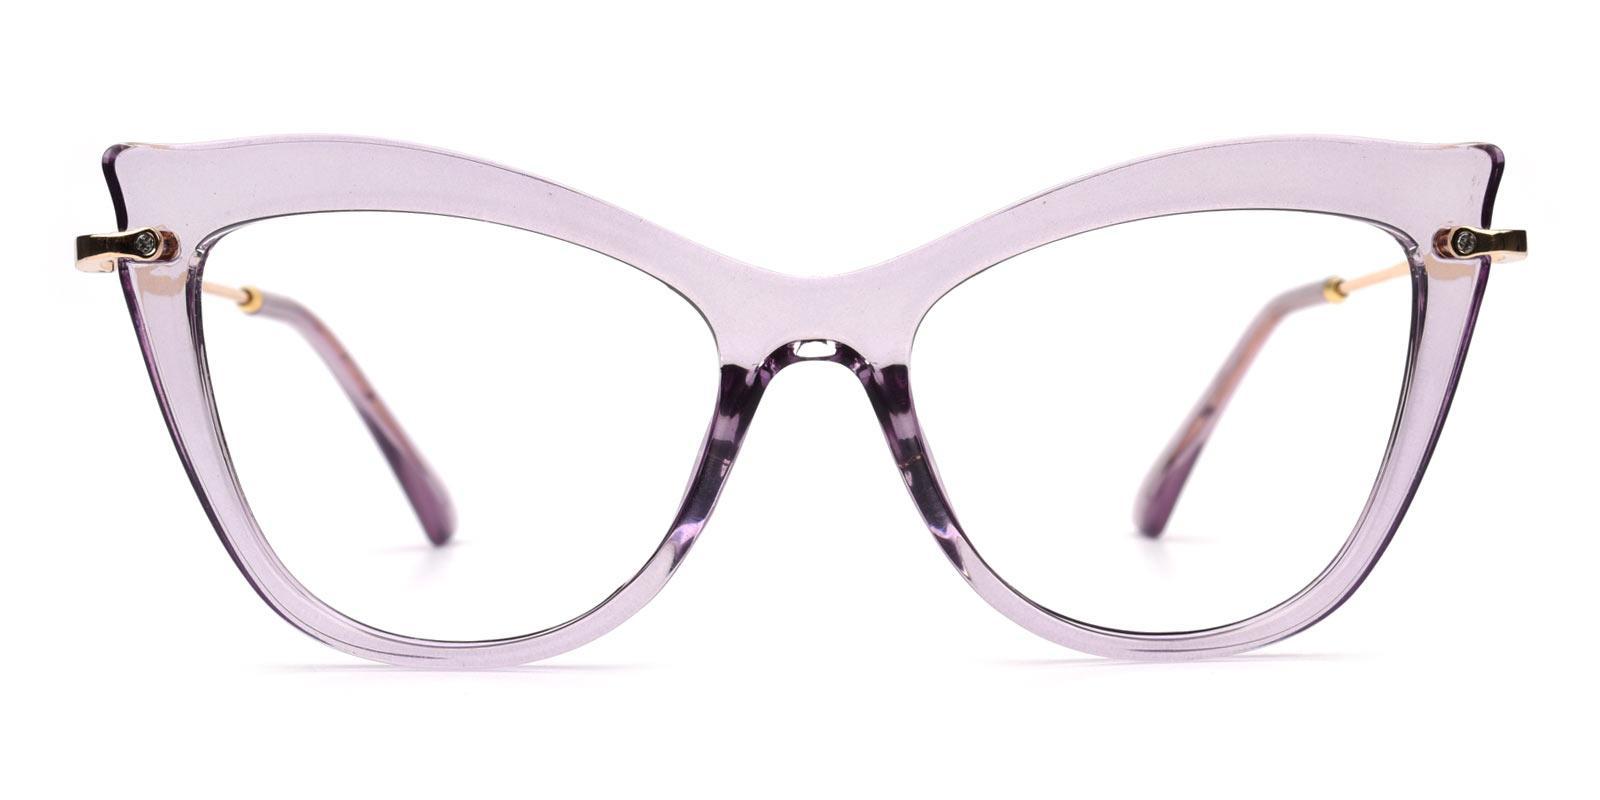 Agatha-Purple-Cat-Combination-Eyeglasses-additional2